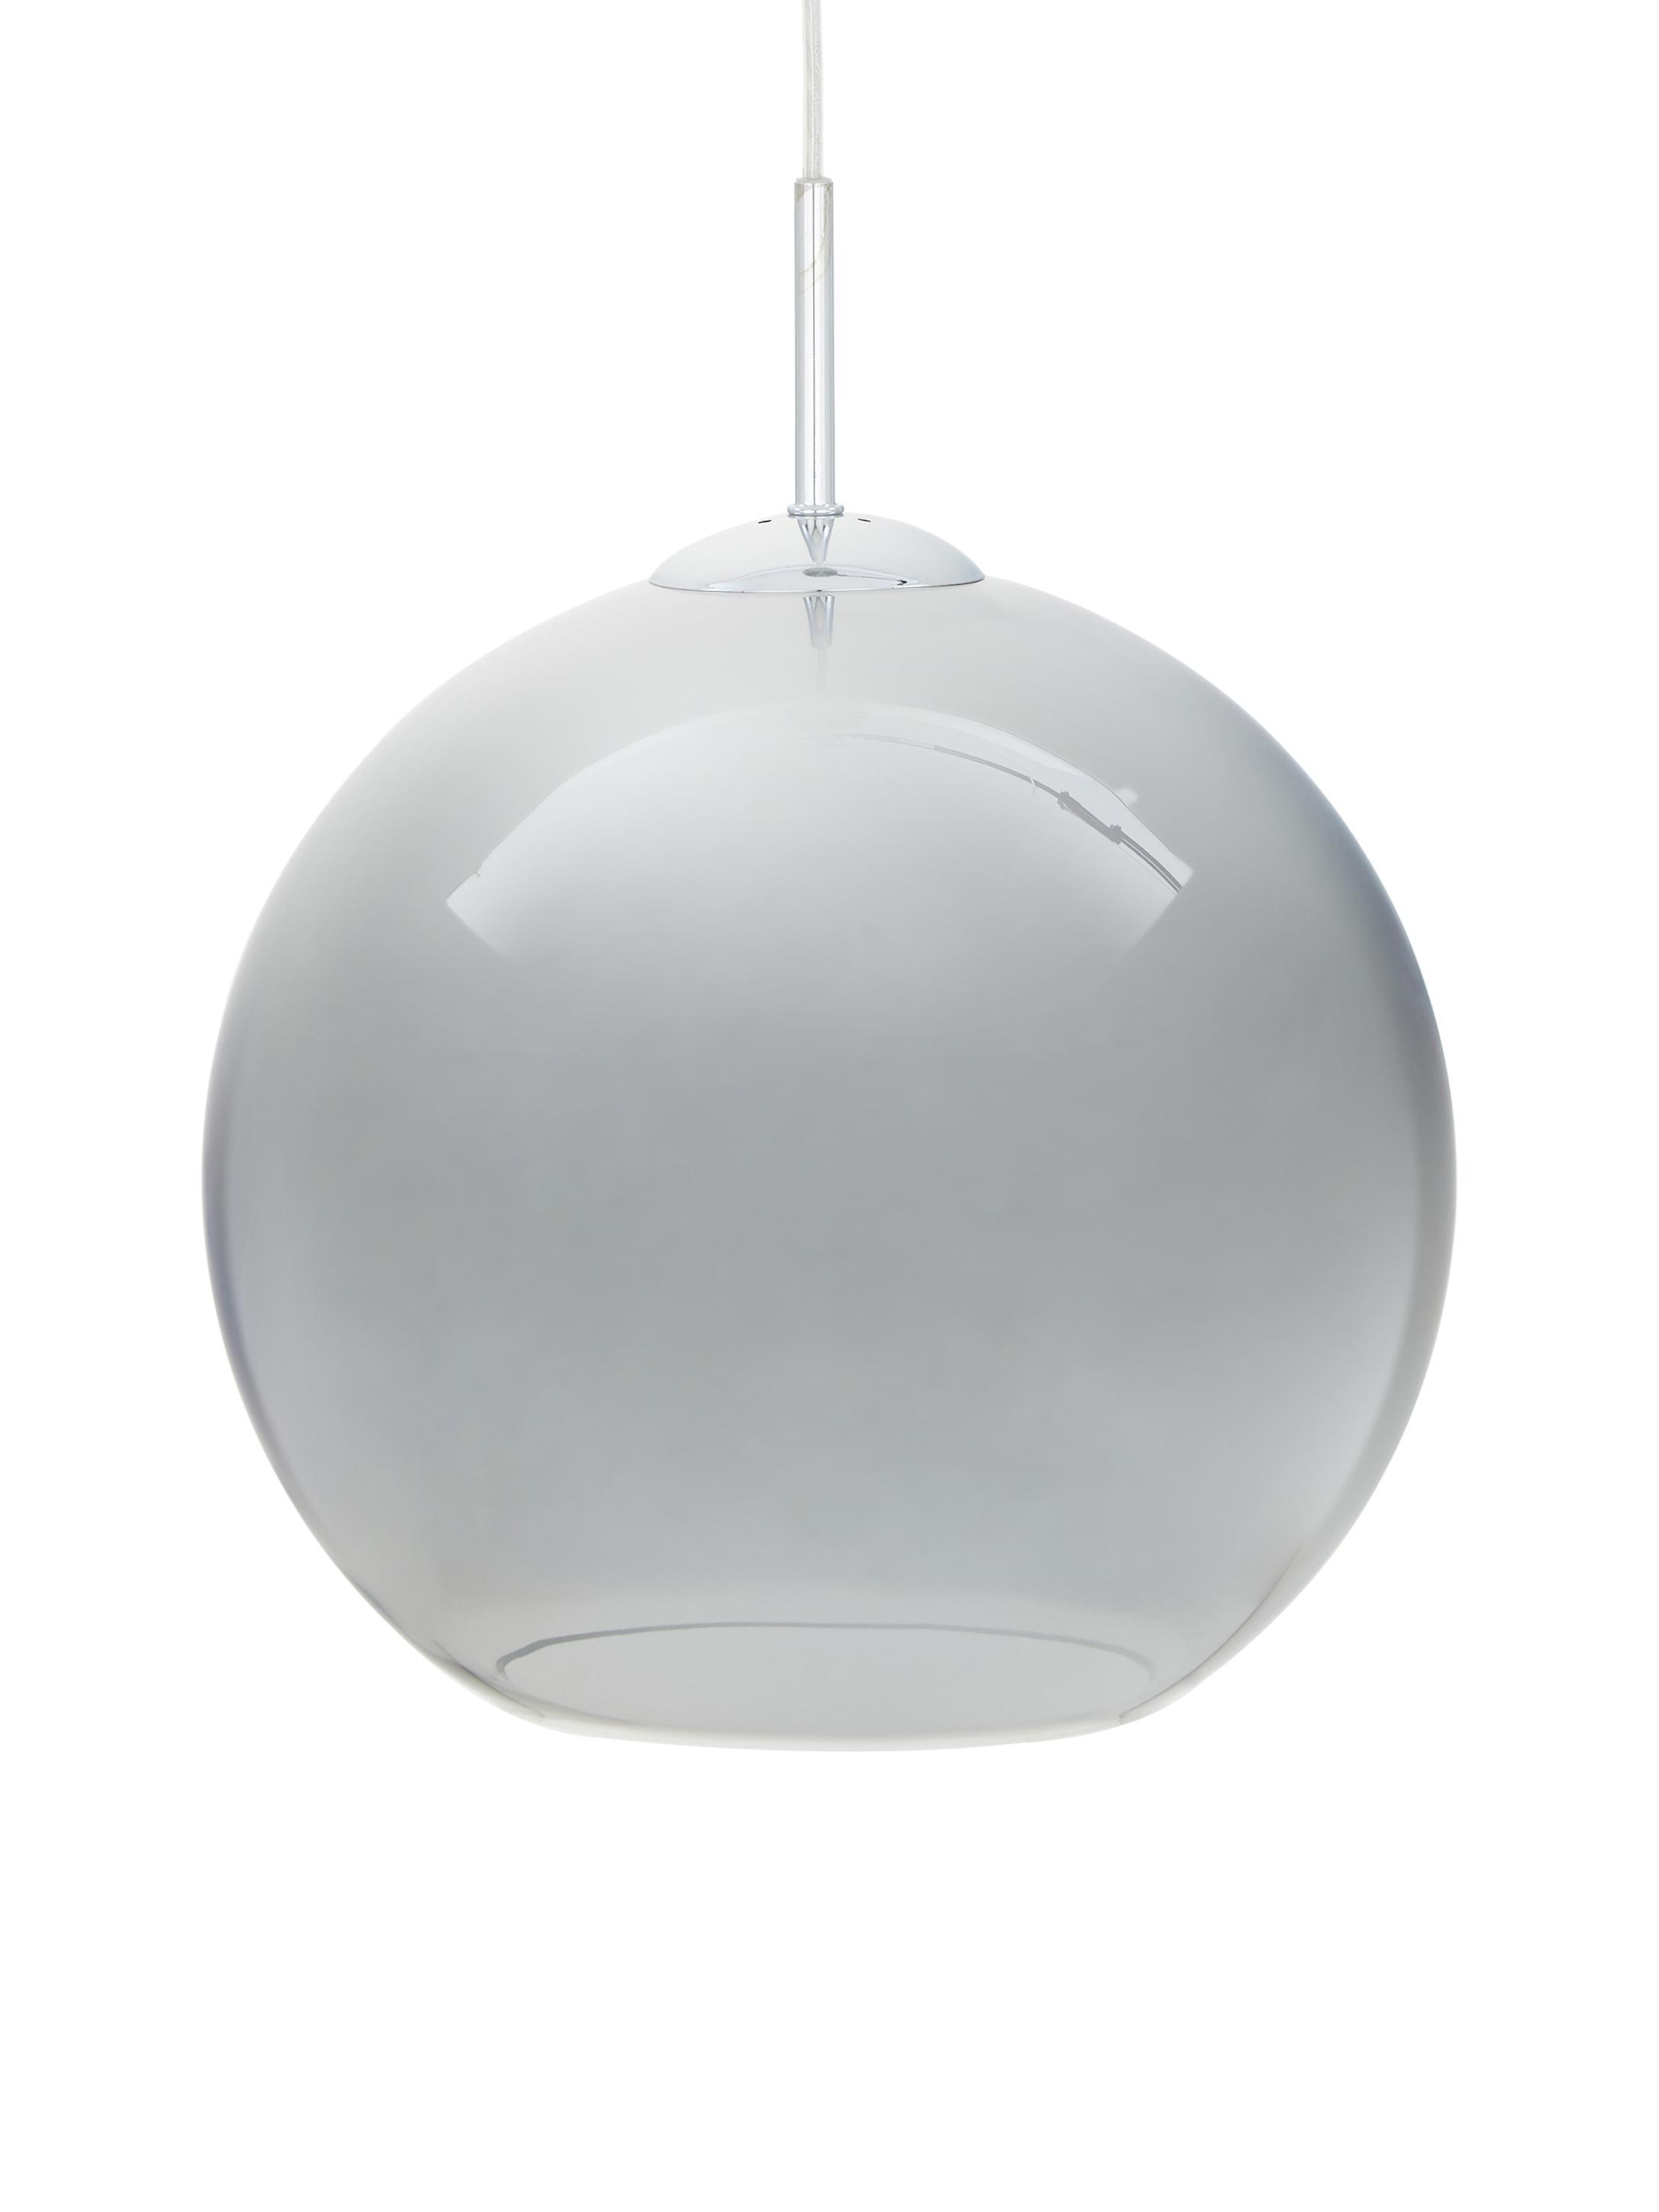 Lampada a sospensione in vetro Soleil, Baldacchino: metallo cromato, Paralume: vetro, Cromo, grigio, Ø 30 cm